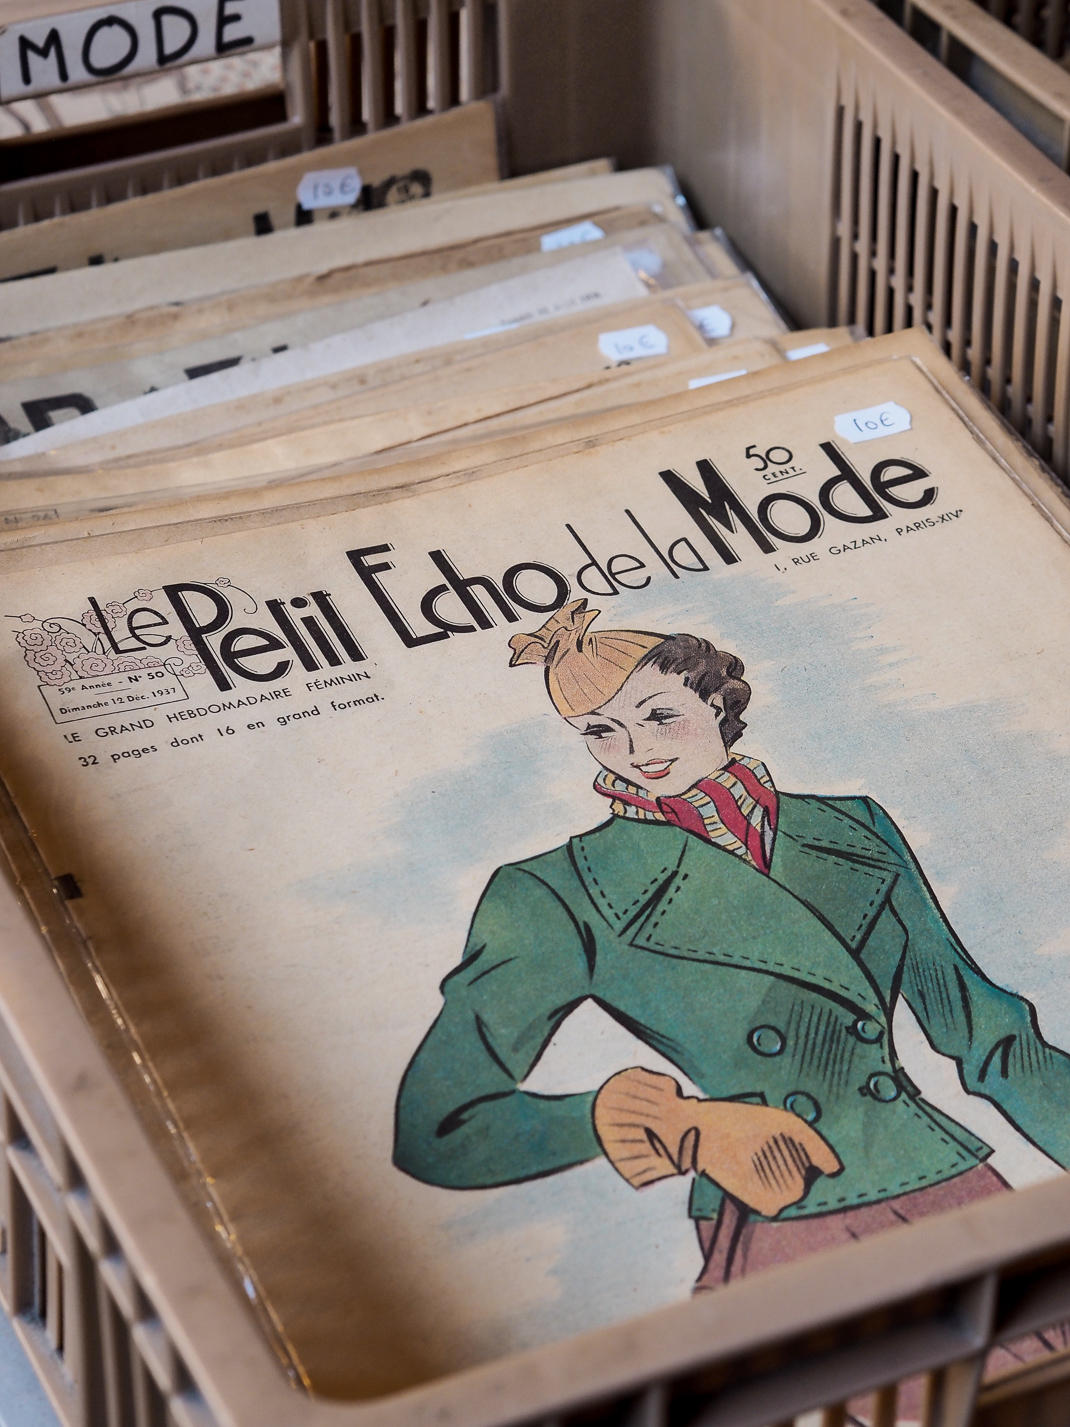 vintages prints for sale in lille